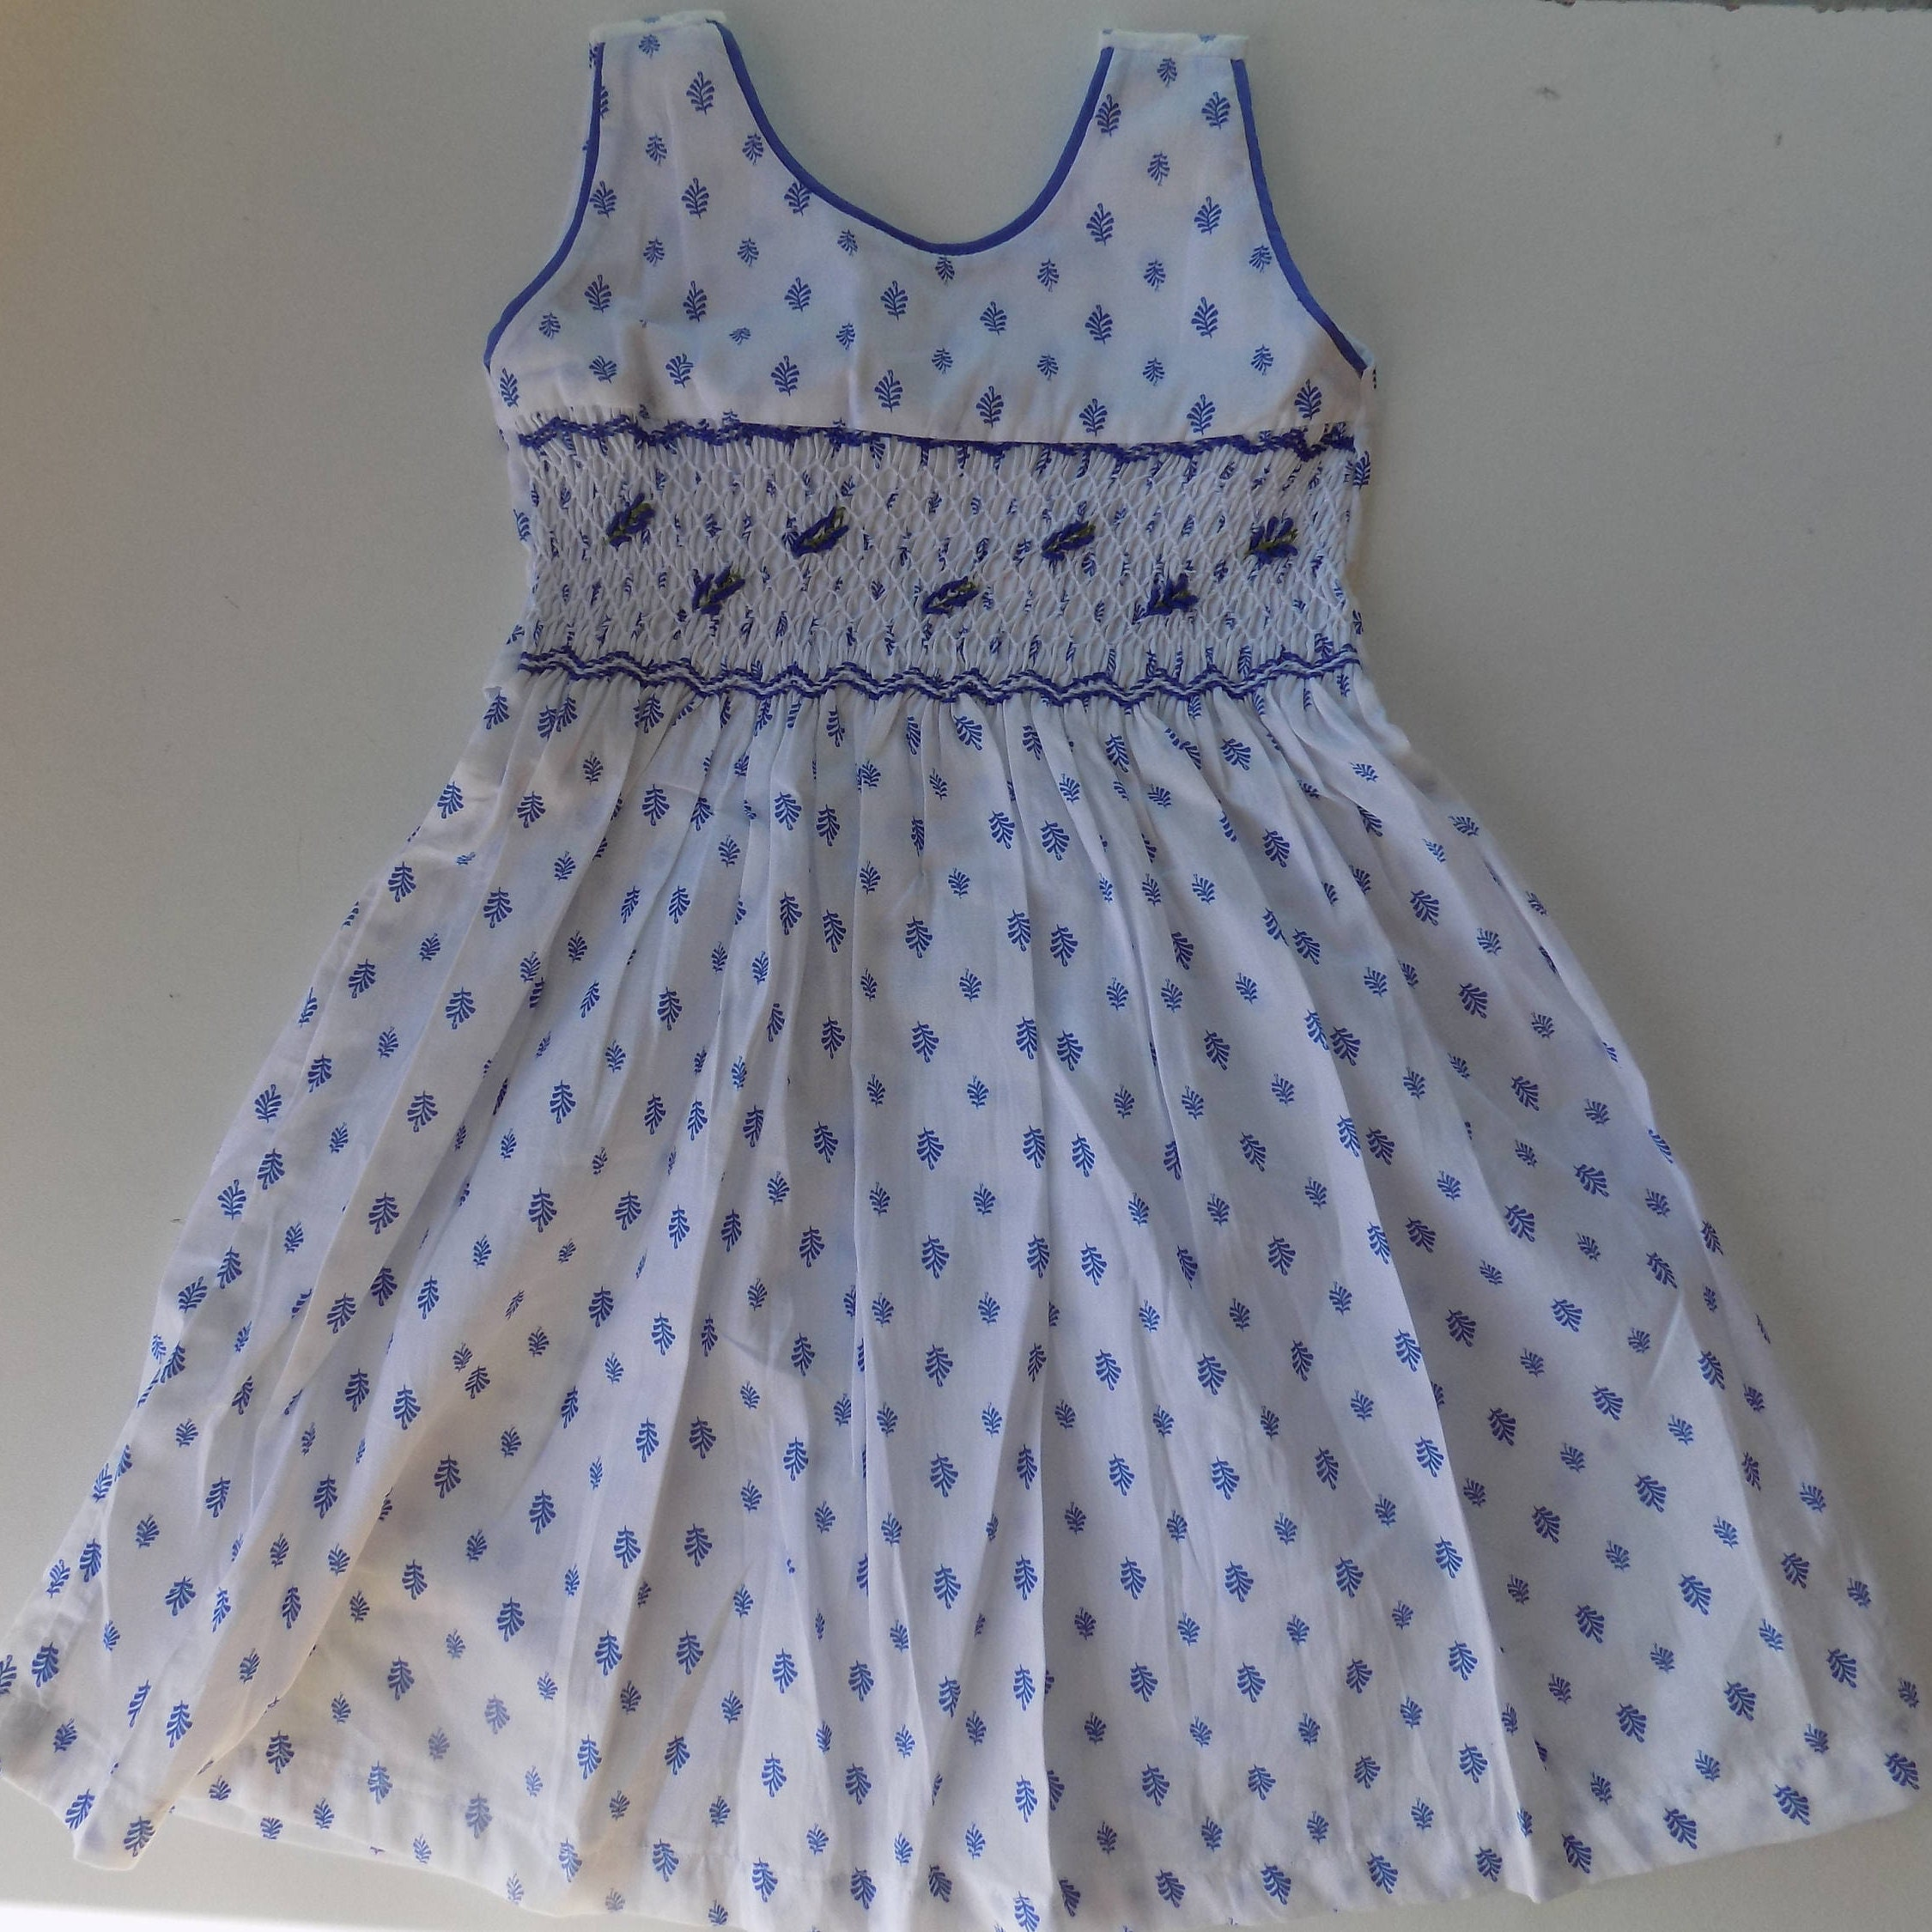 b7697d381c9 White dress